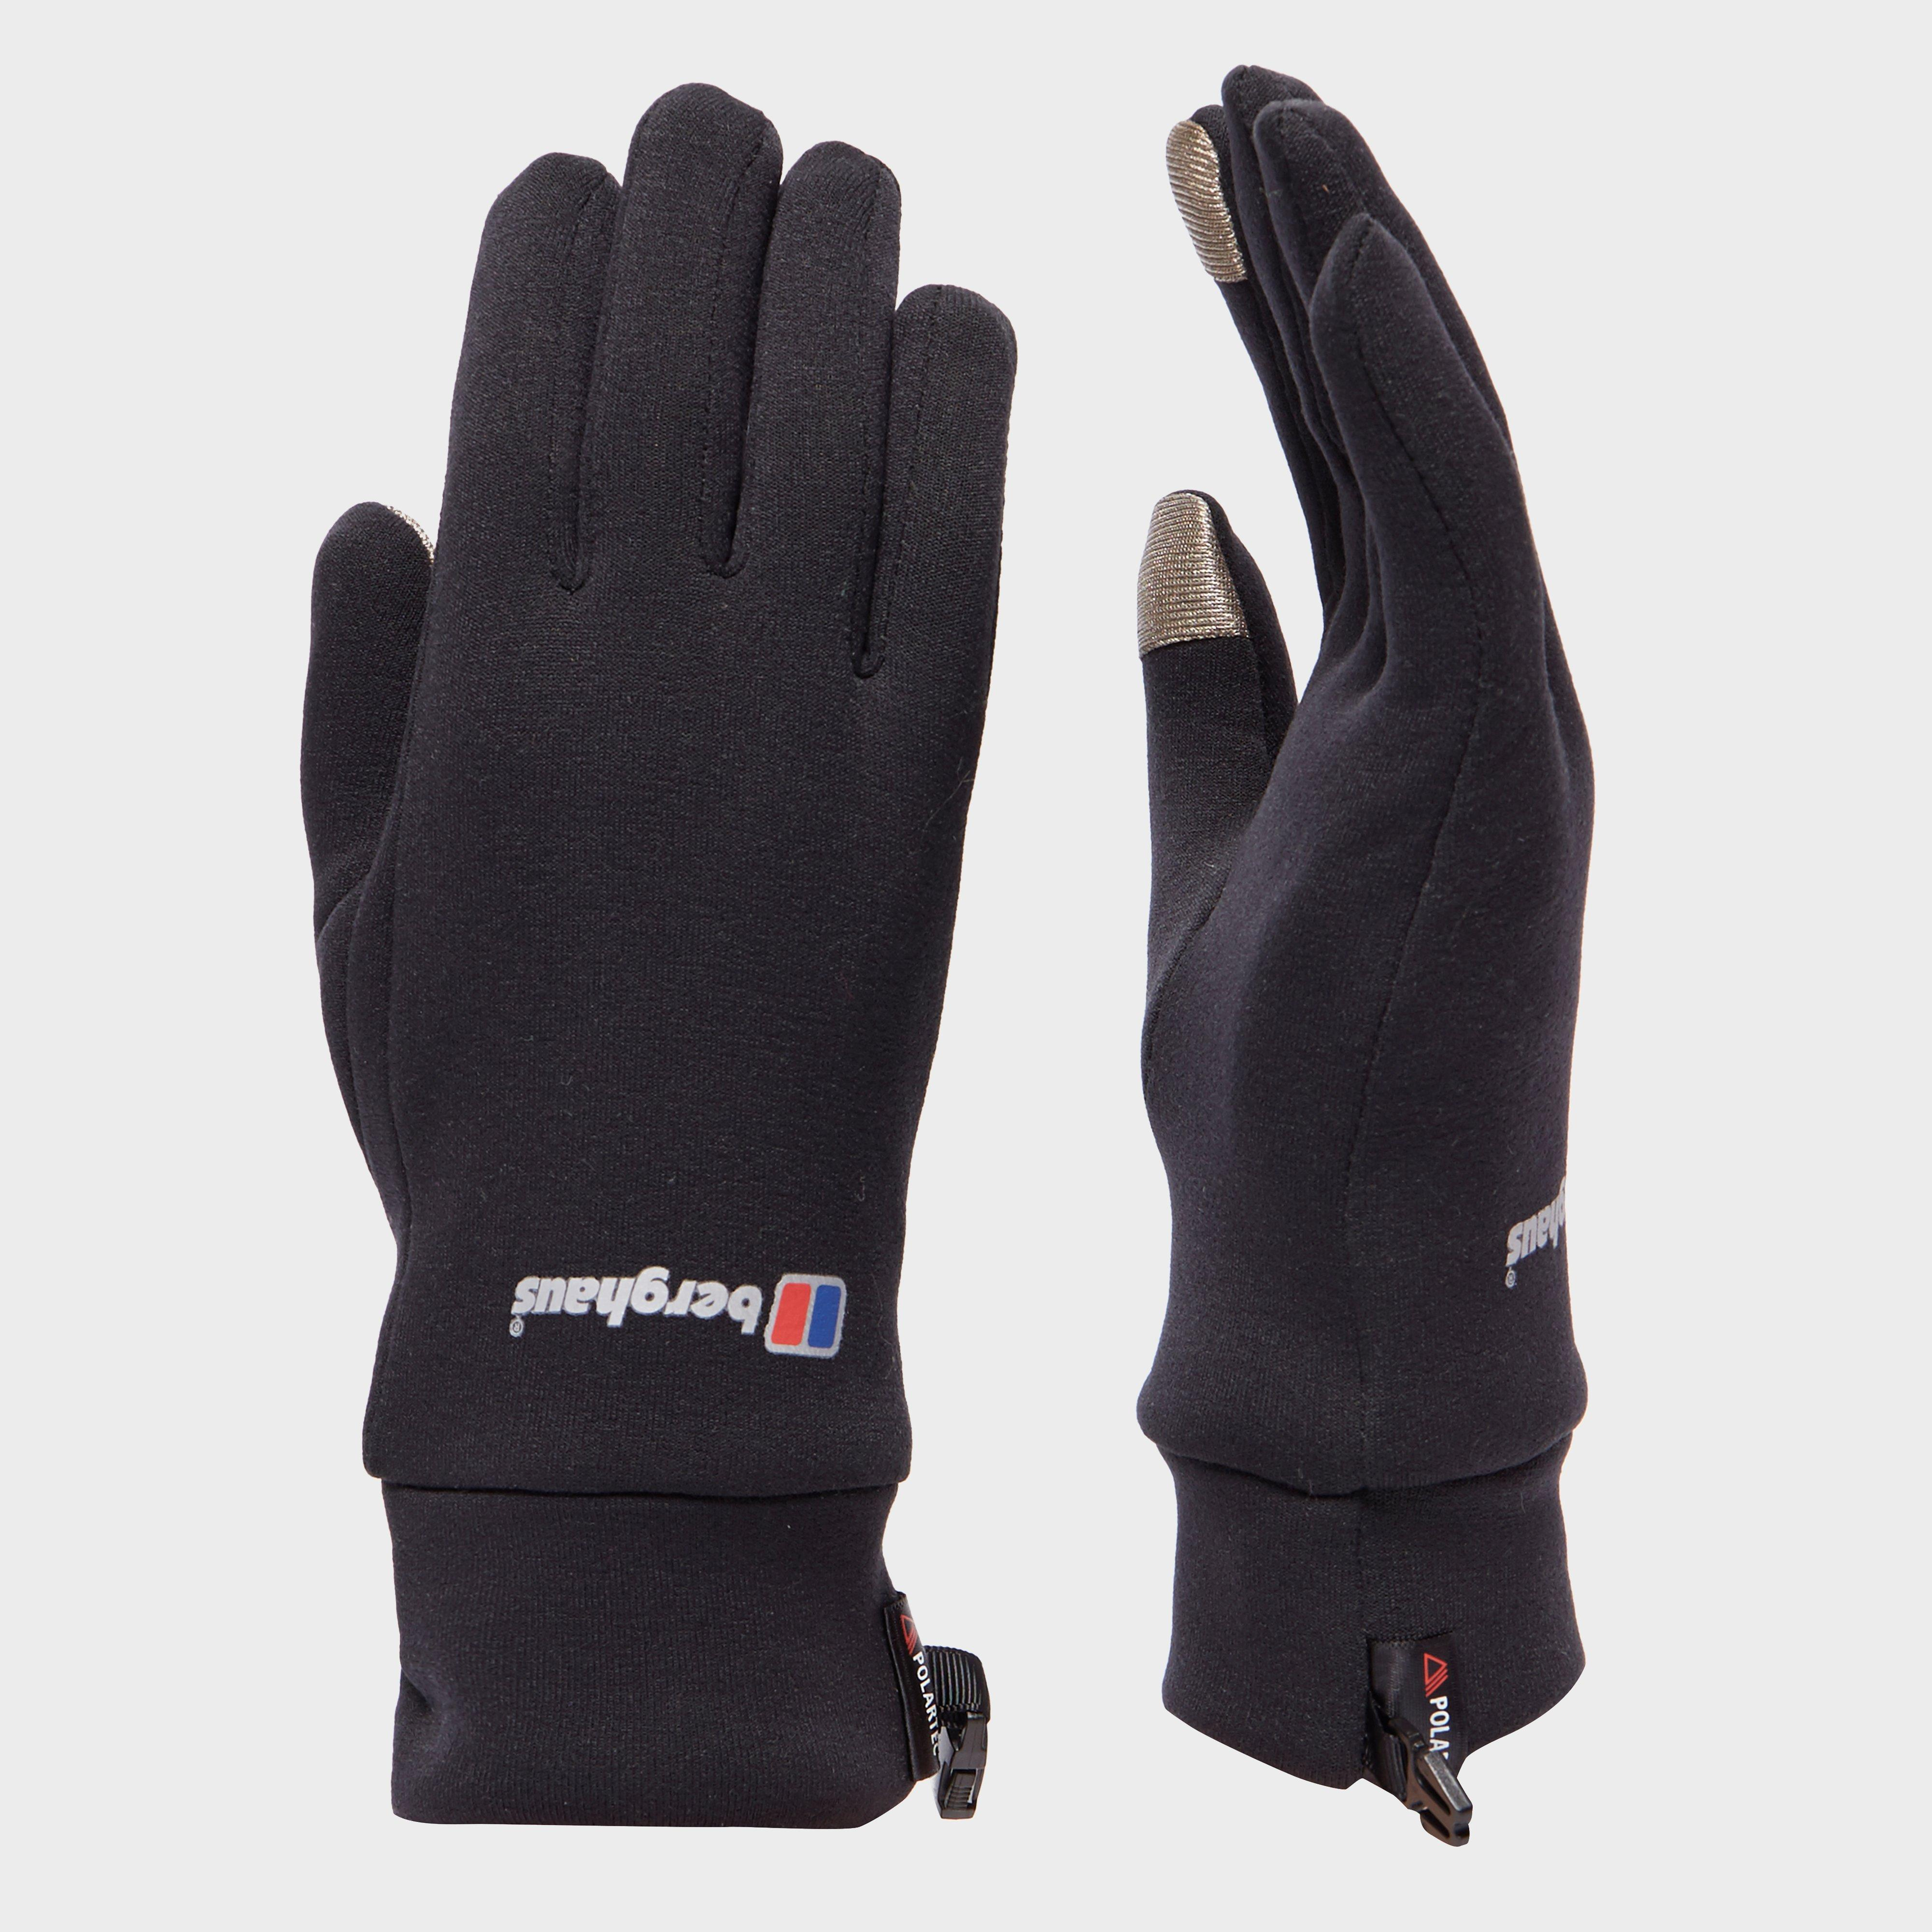 Berghaus Touch Screen Gloves - Black  Black